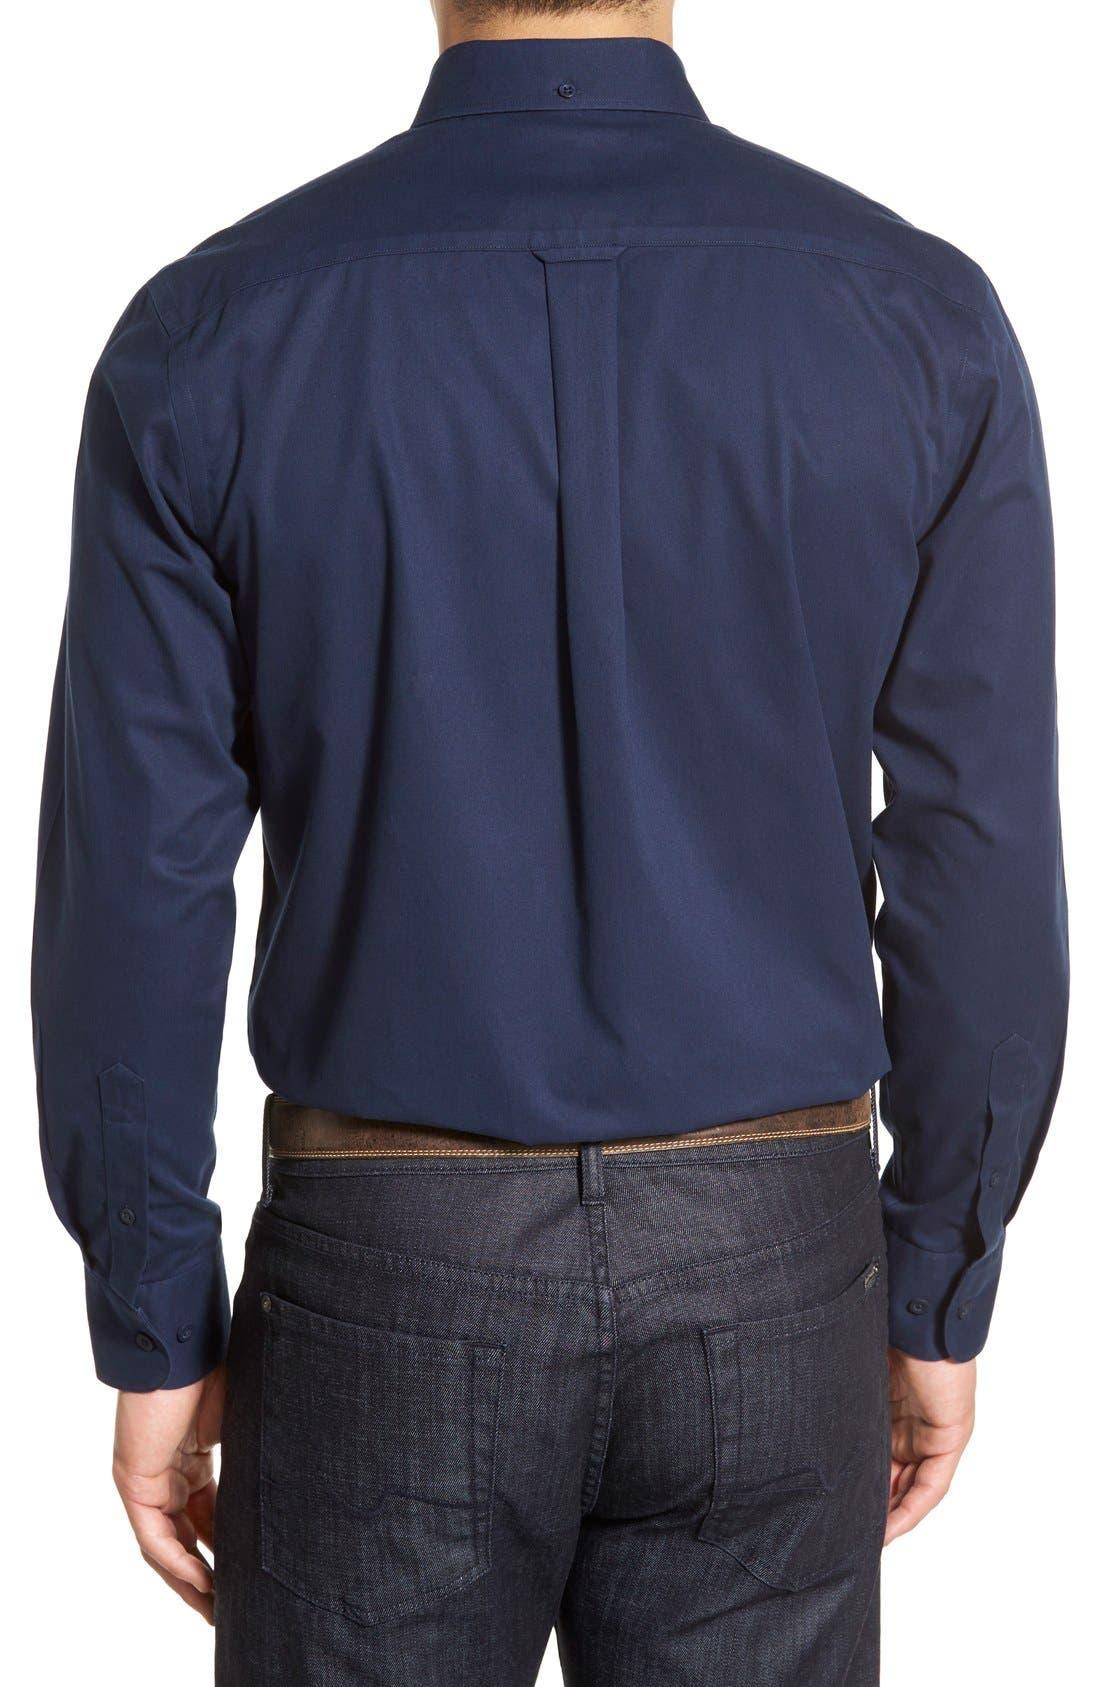 Alternate Image 2  - Nordstrom Men's Shop Smartcare™ Traditional Fit Twill Boat Shirt (Regular & Tall)